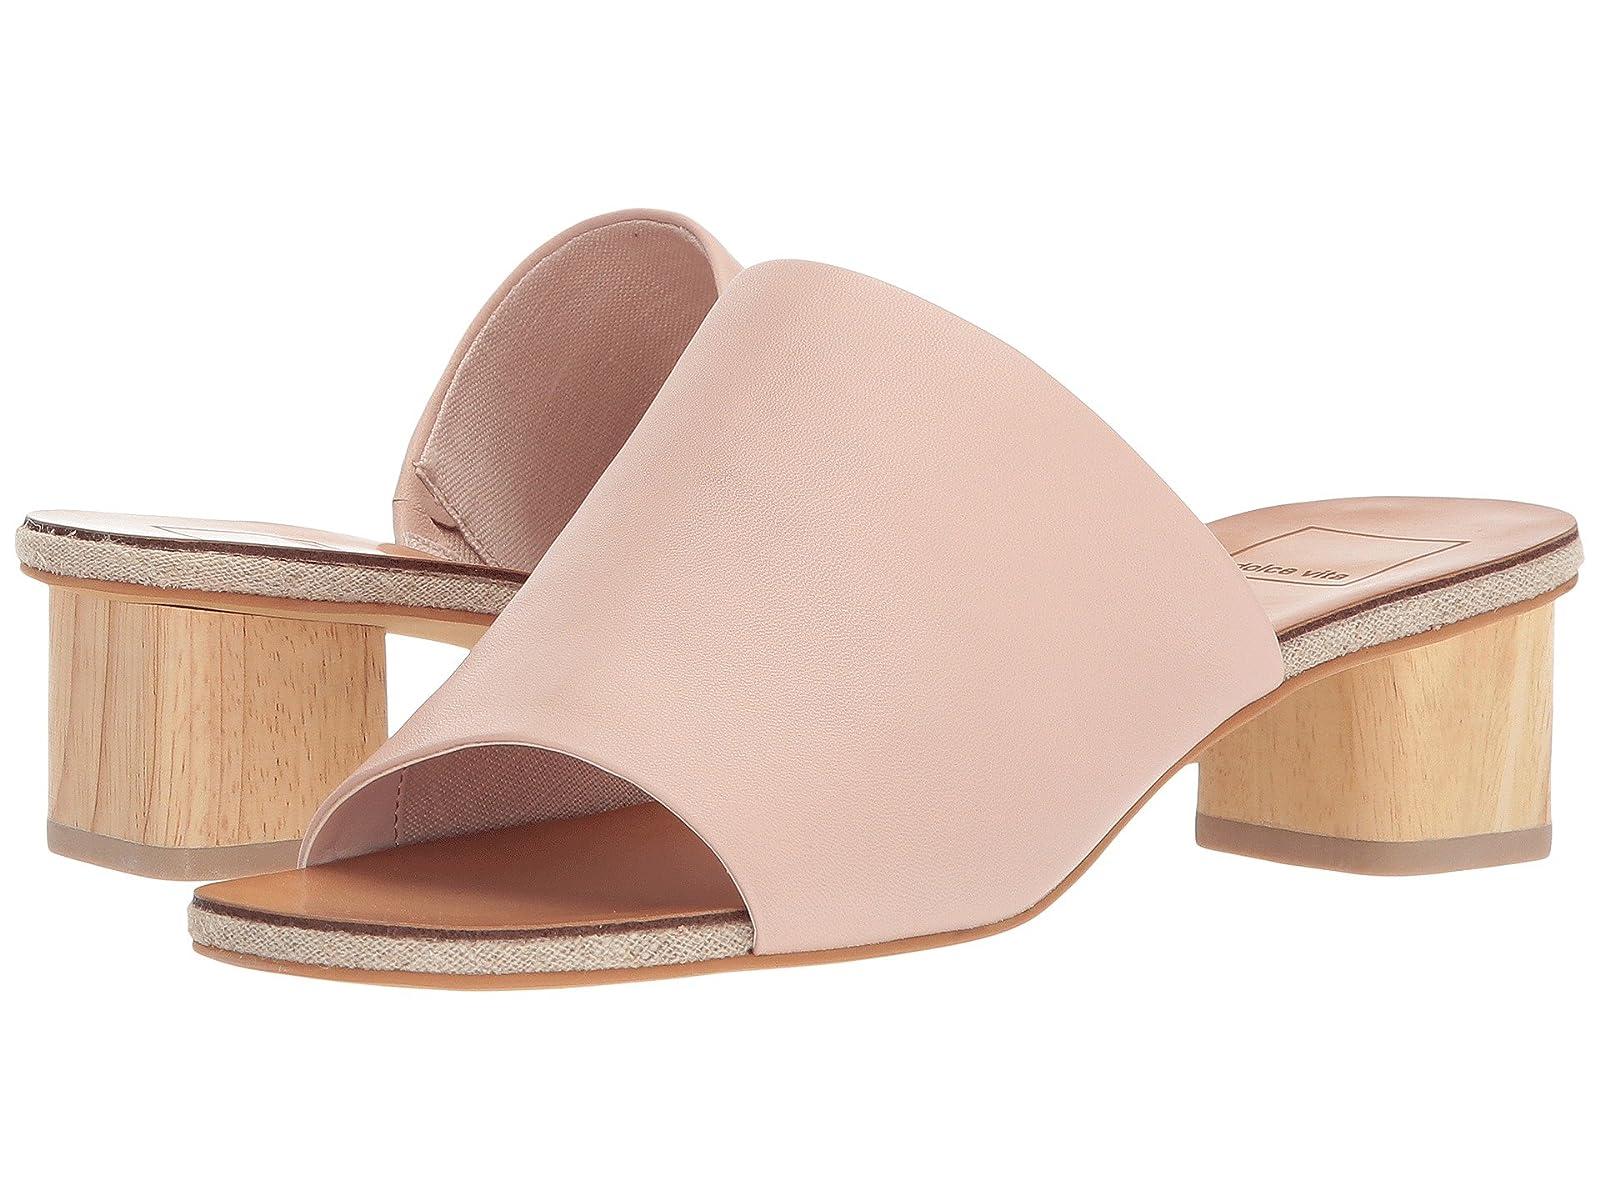 Dolce Vita KairaCheap and distinctive eye-catching shoes